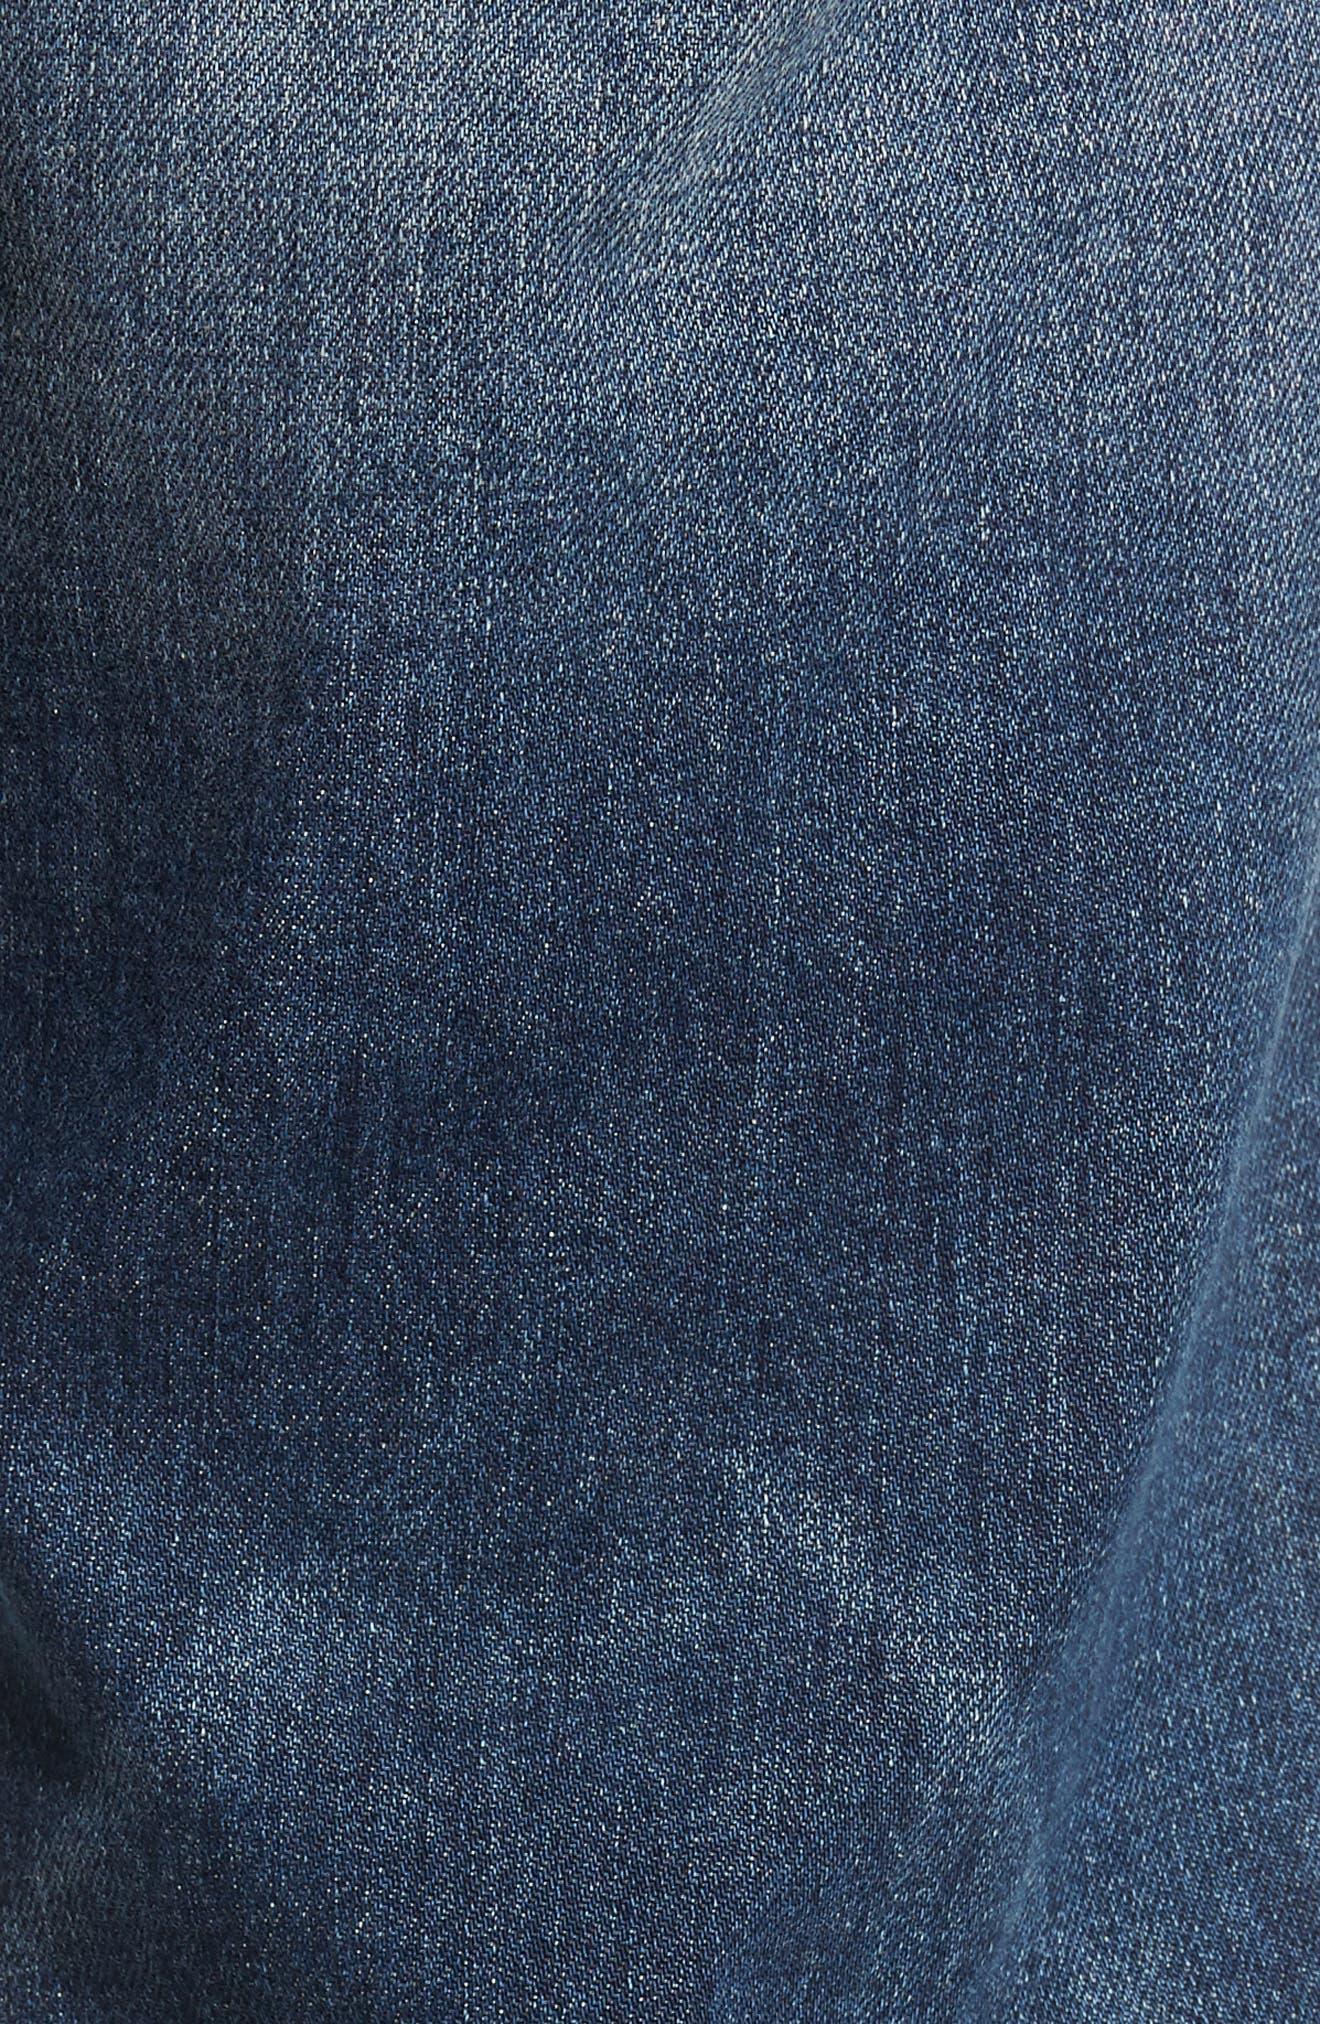 Geno Slim Straight Leg Jeans,                             Alternate thumbnail 5, color,                             JETSET BLUE